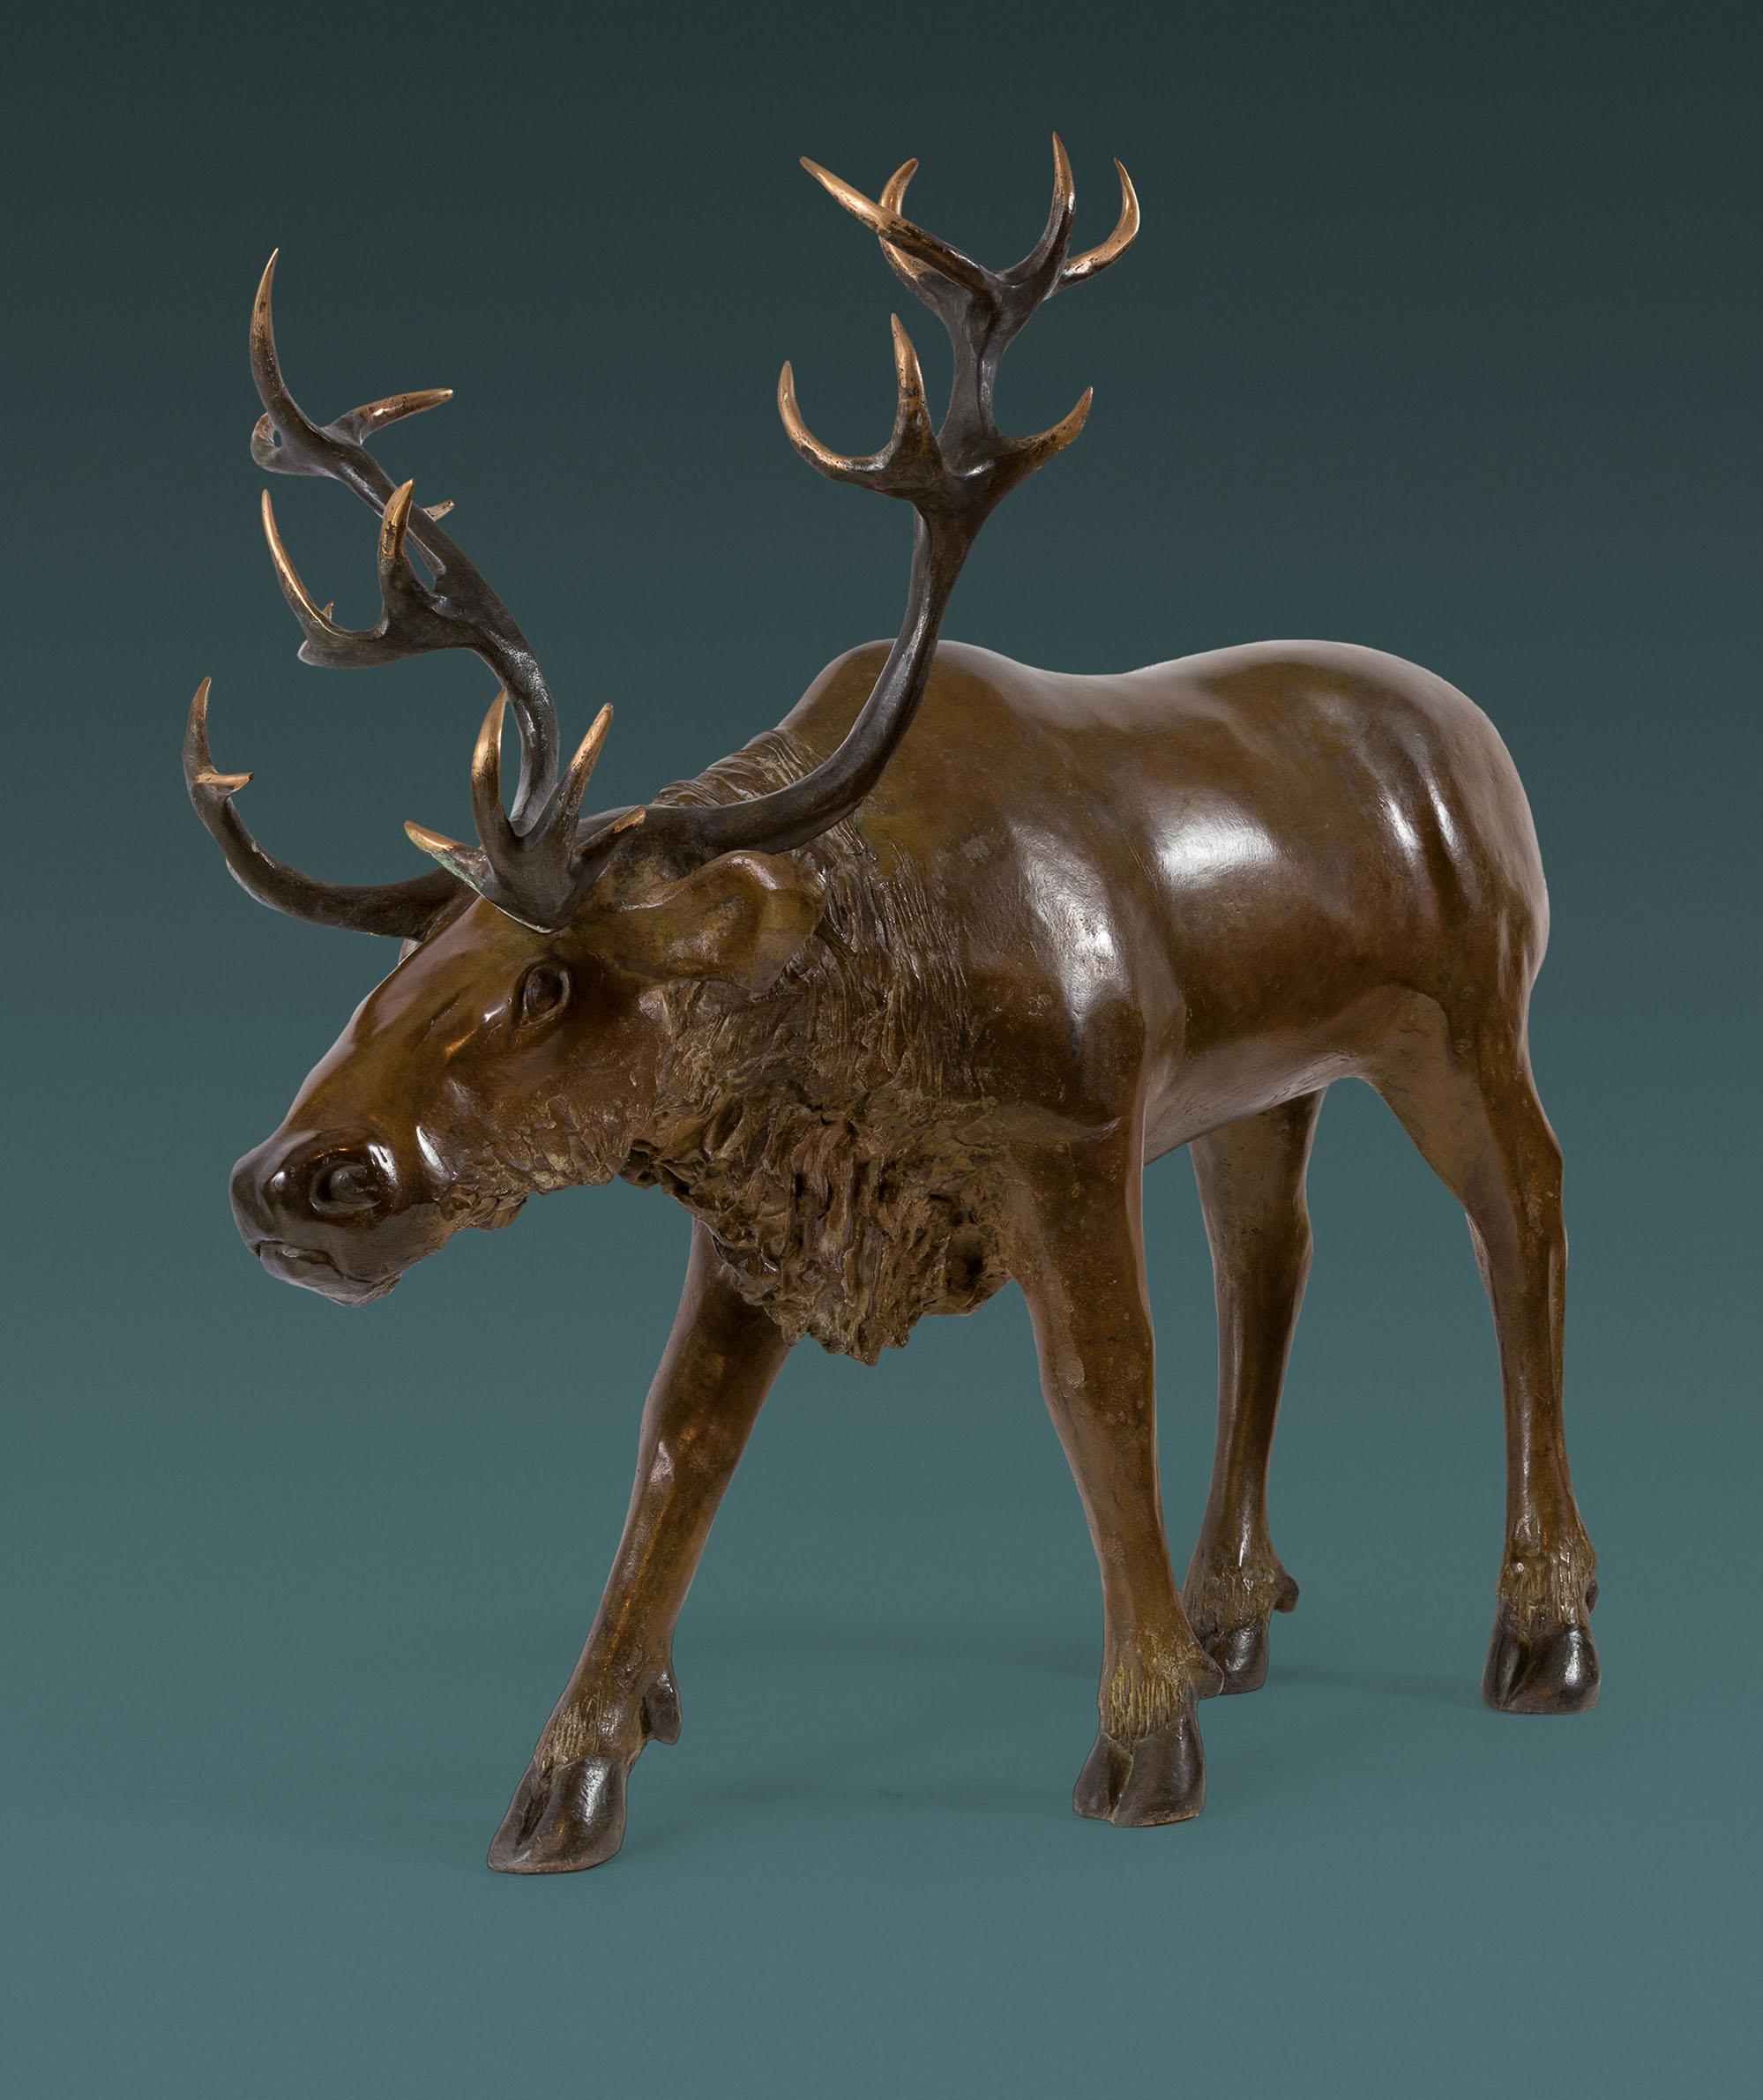 Jean Lemonnier - Renne, bronze, H 70, 80, 38 cm